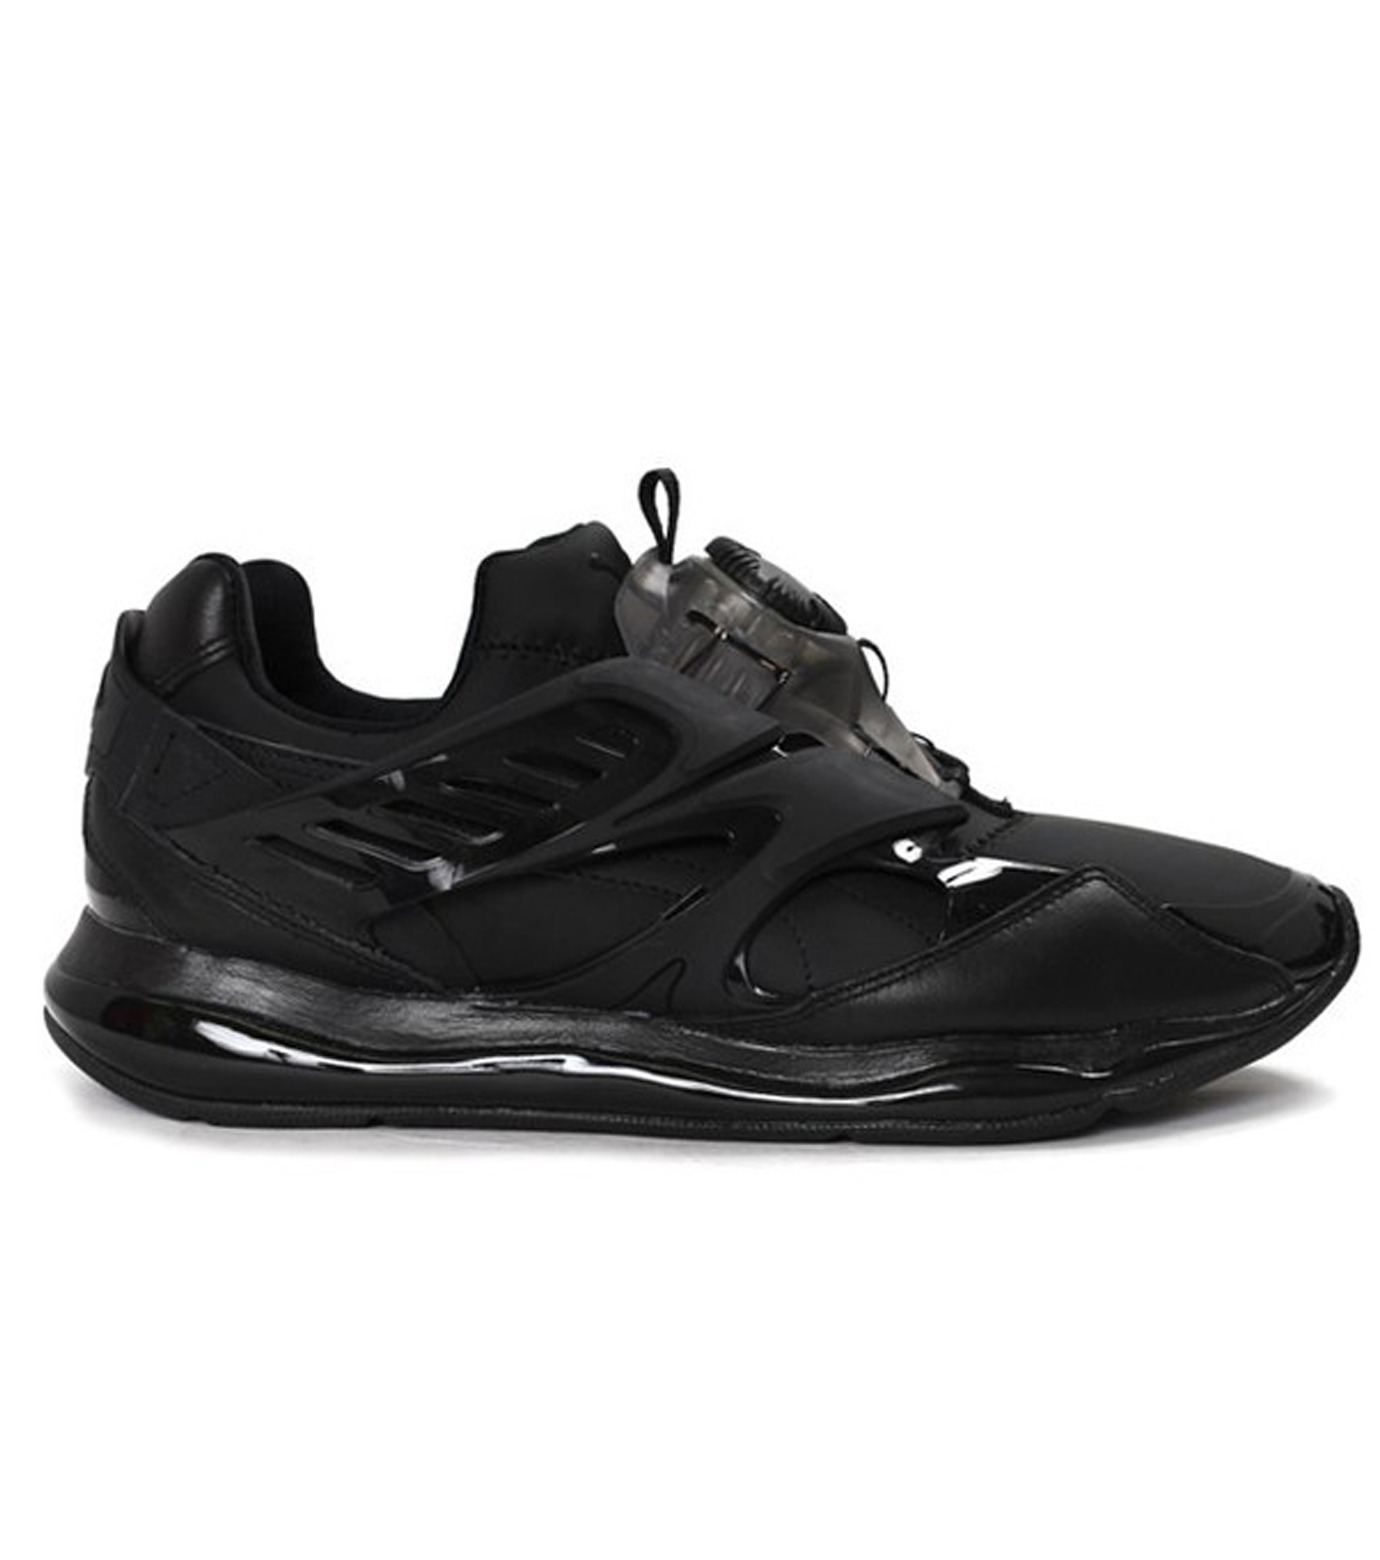 PUMA(プーマ)のDISC BLAZE CELL-BLACK(シューズ/shoes)-360078-13 拡大詳細画像1